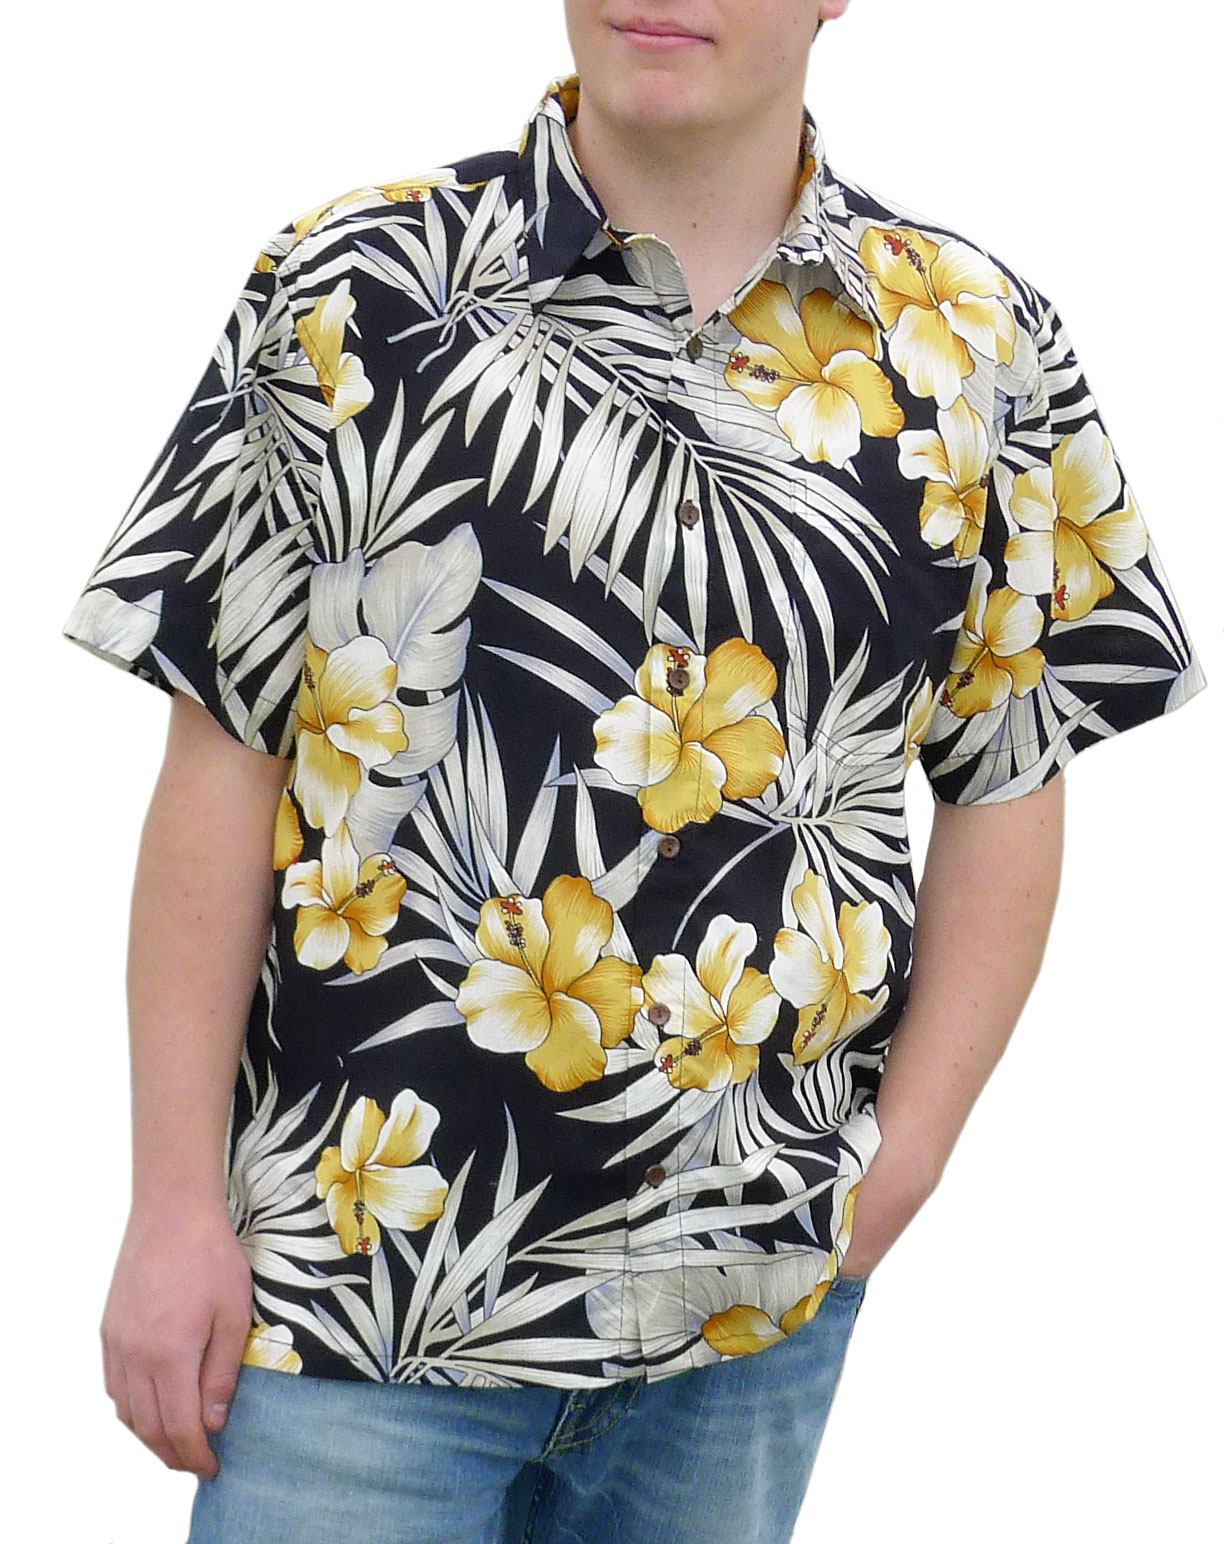 Hawaiian Shirt Black And Gold Floral Aloha Flower Design Small